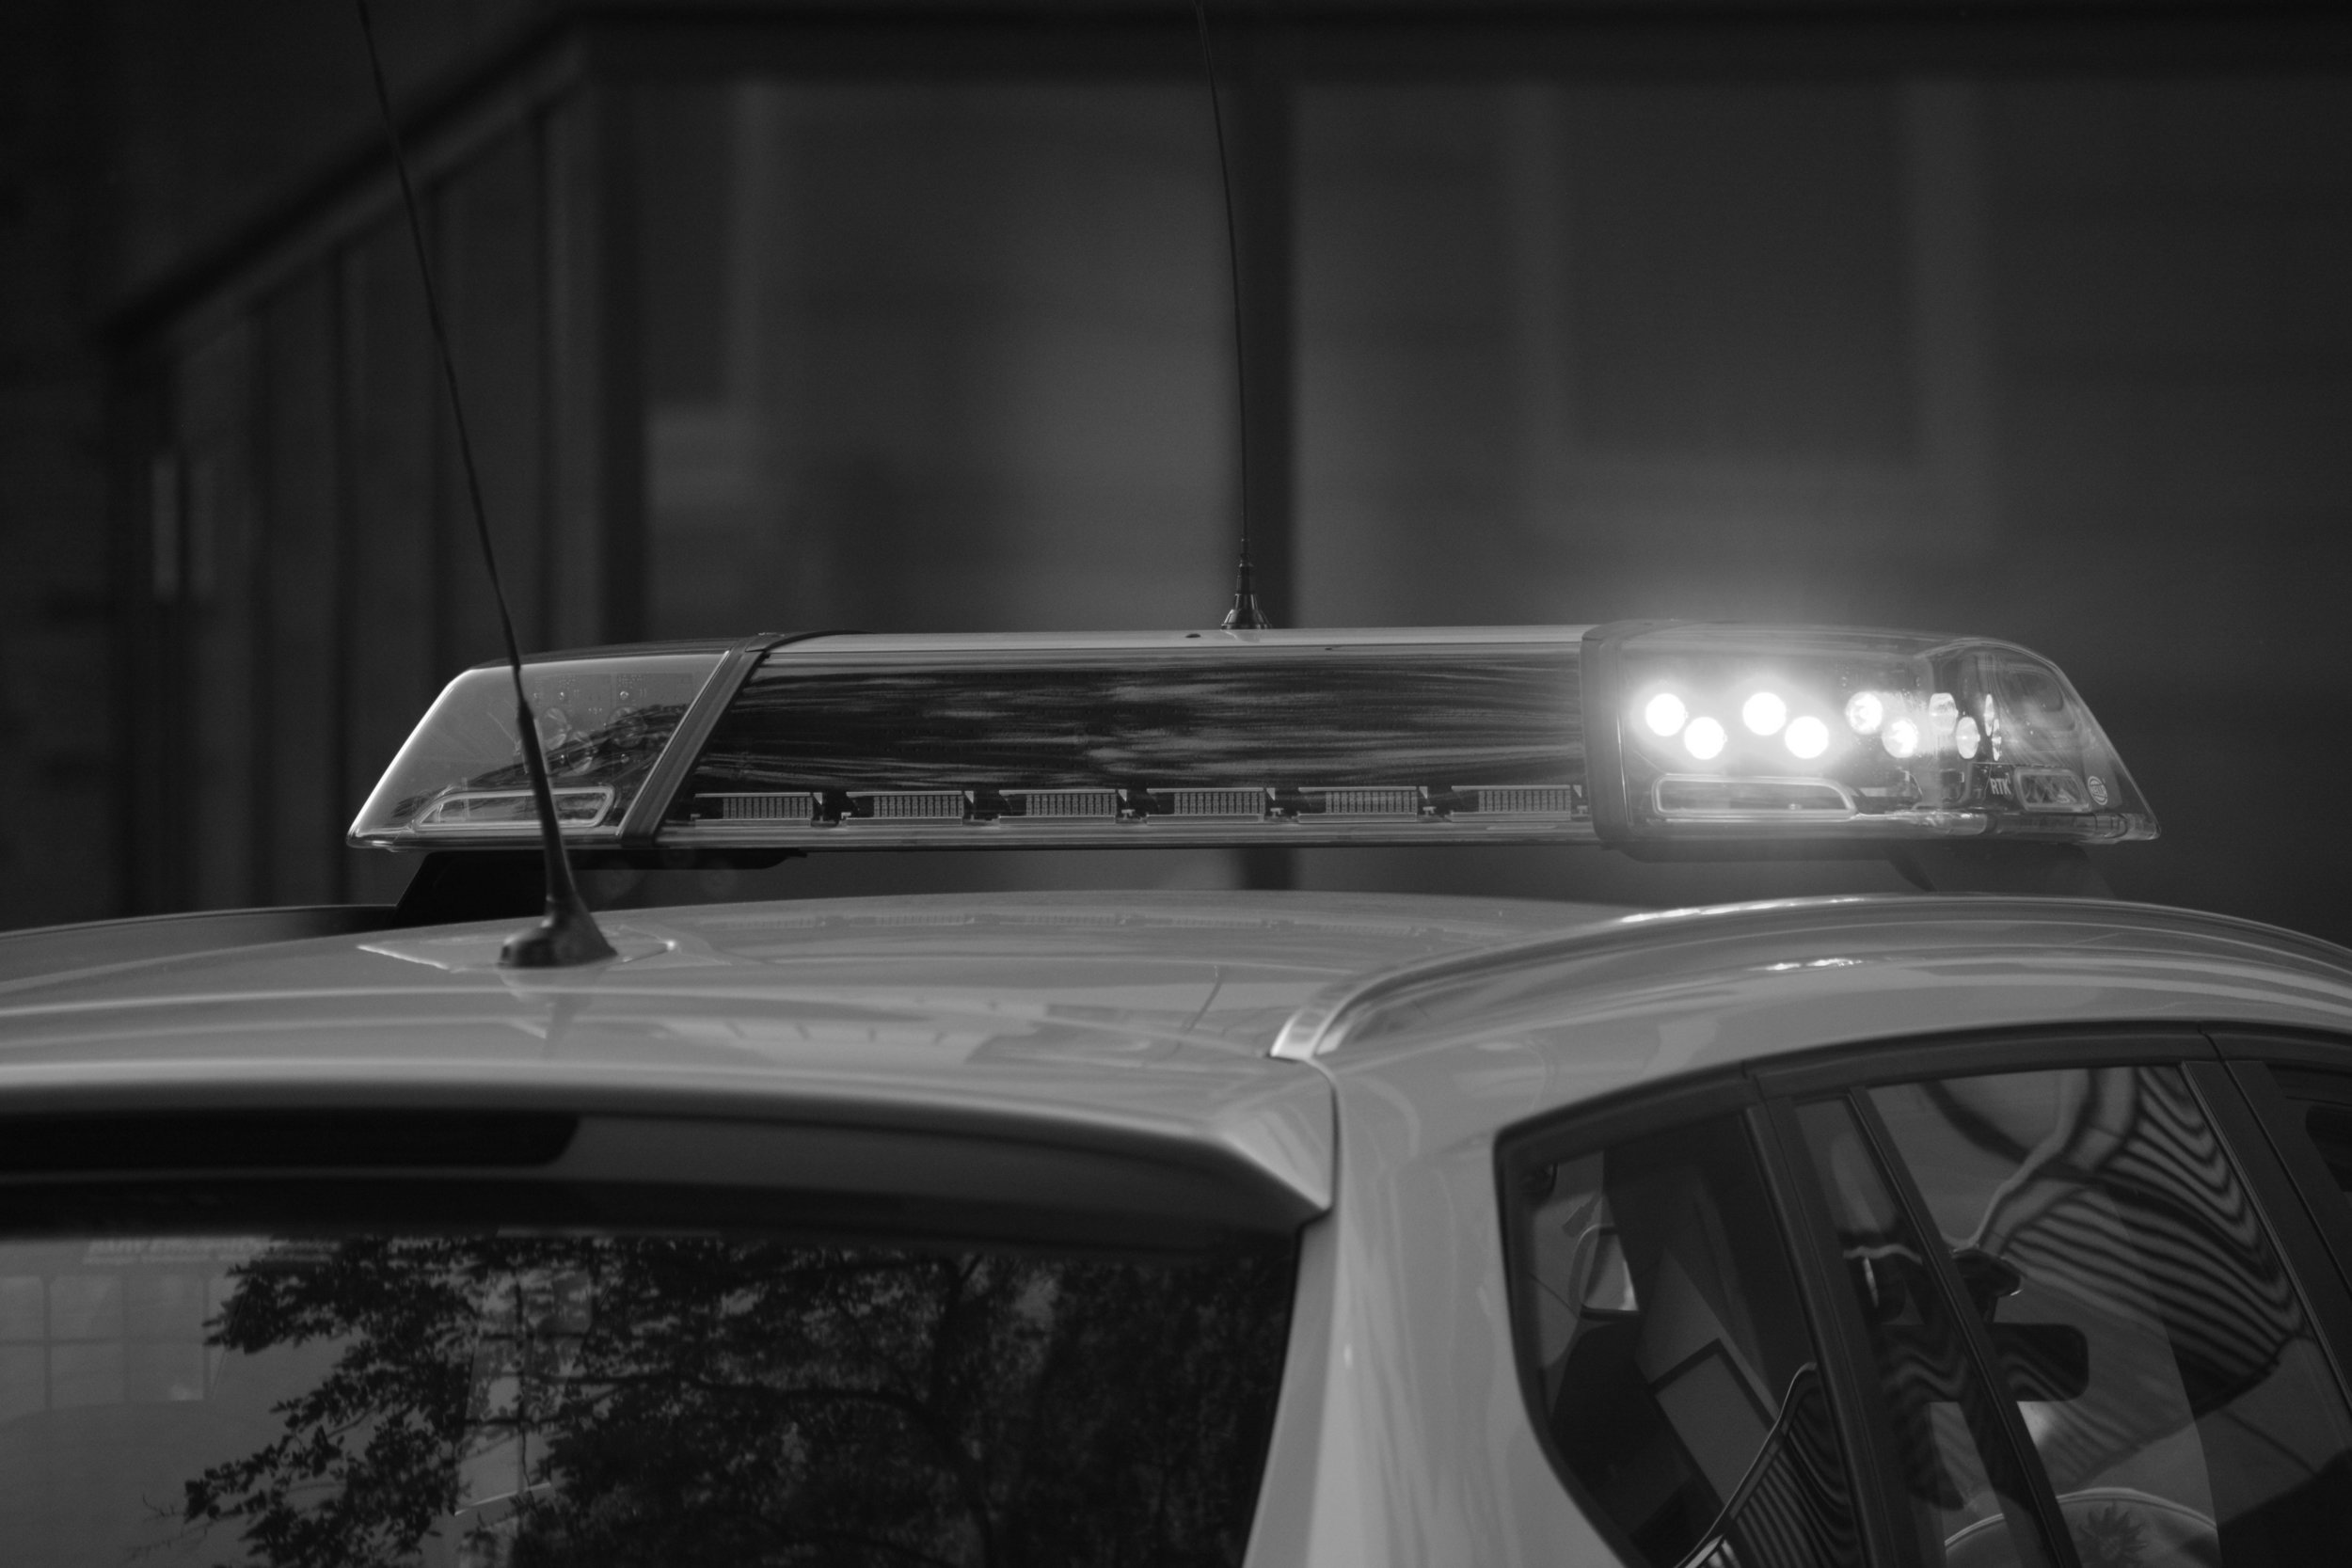 auto-automobile-blur-532001-ConvertImage.jpg